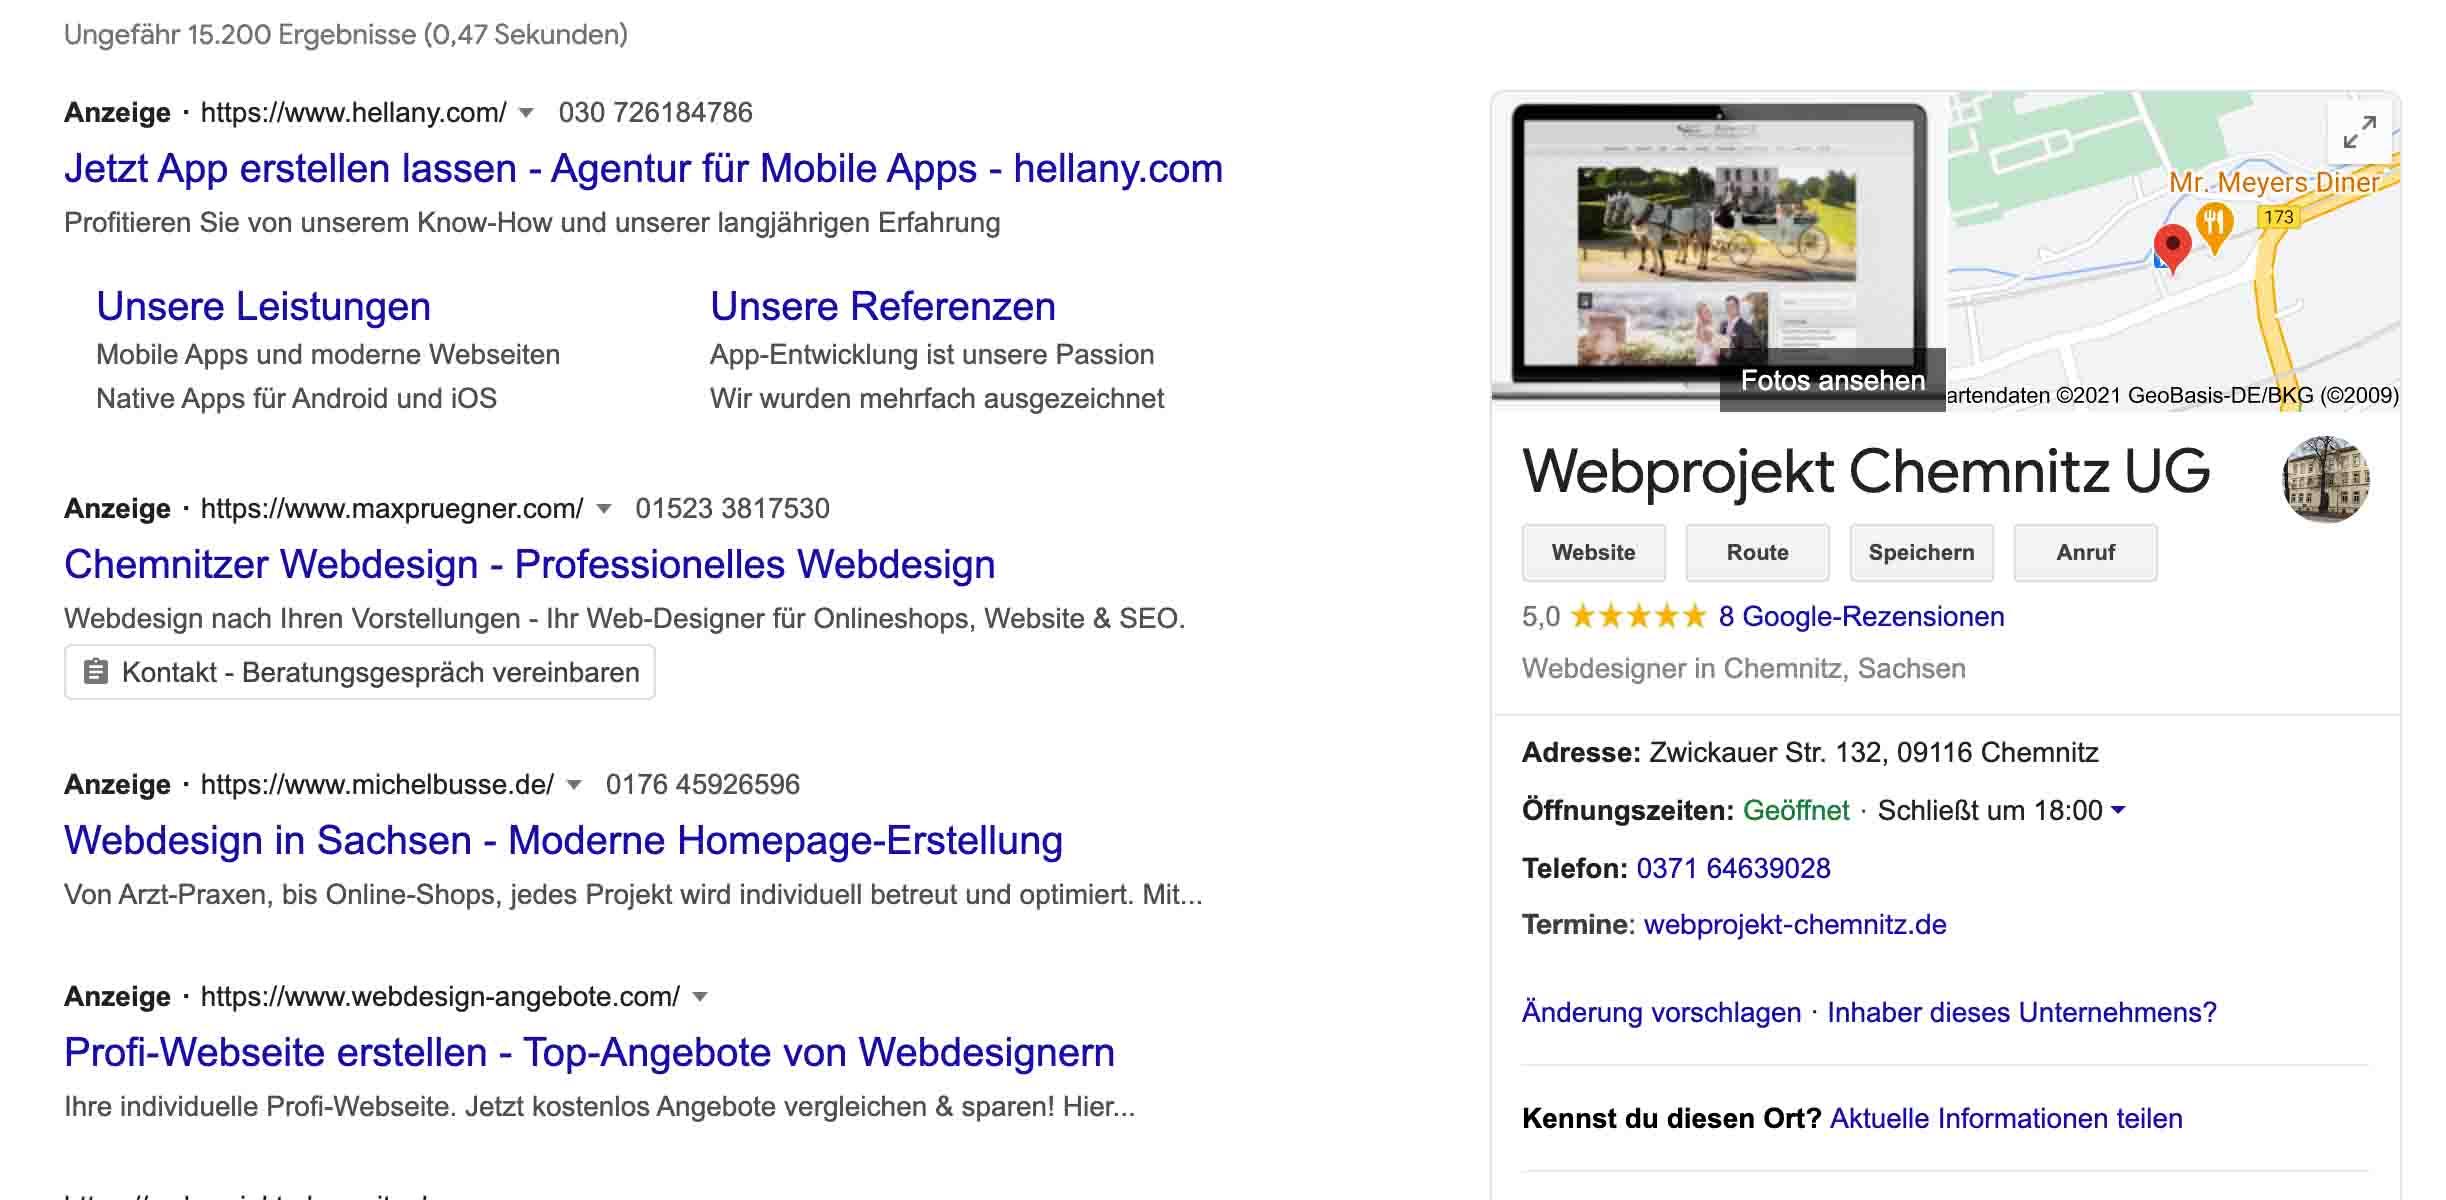 webprojekt-chemnitz-local-seo-lokale-suche